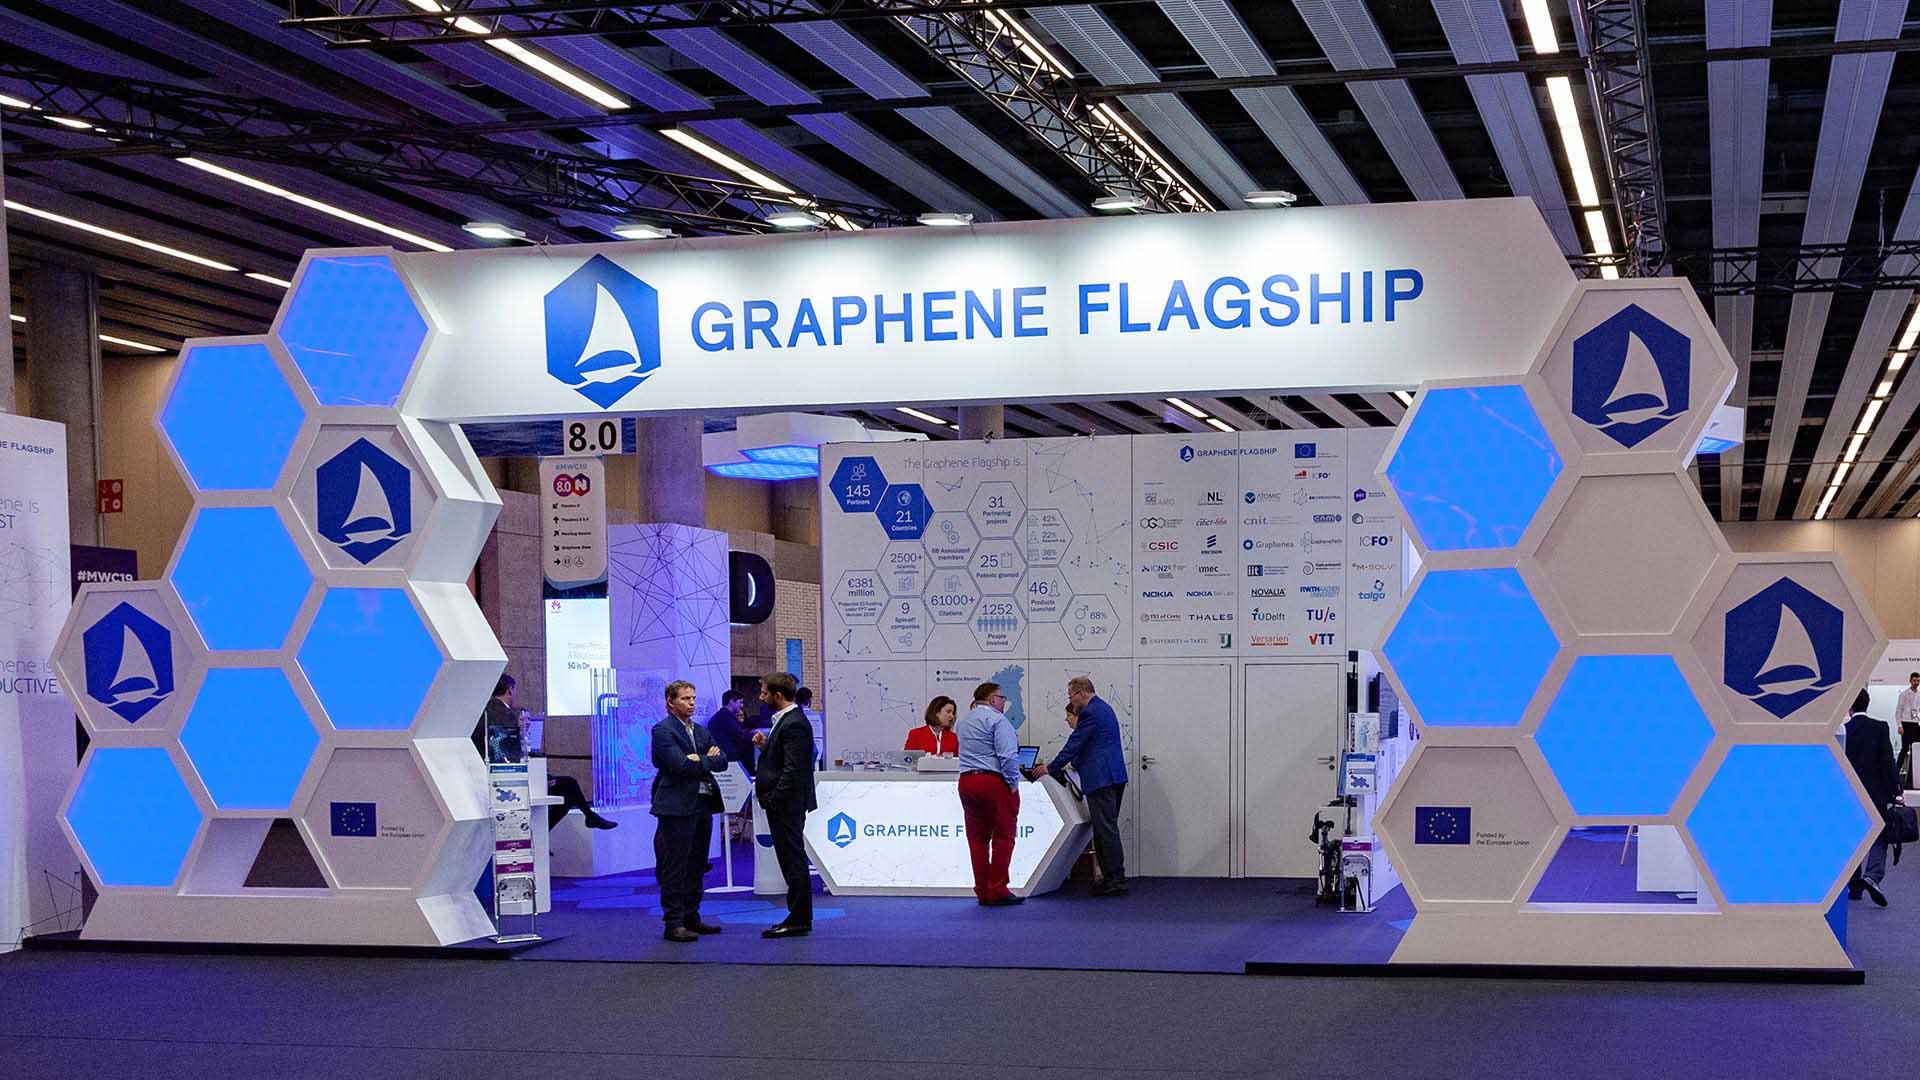 Mobile world congress. Diseño stand graphene